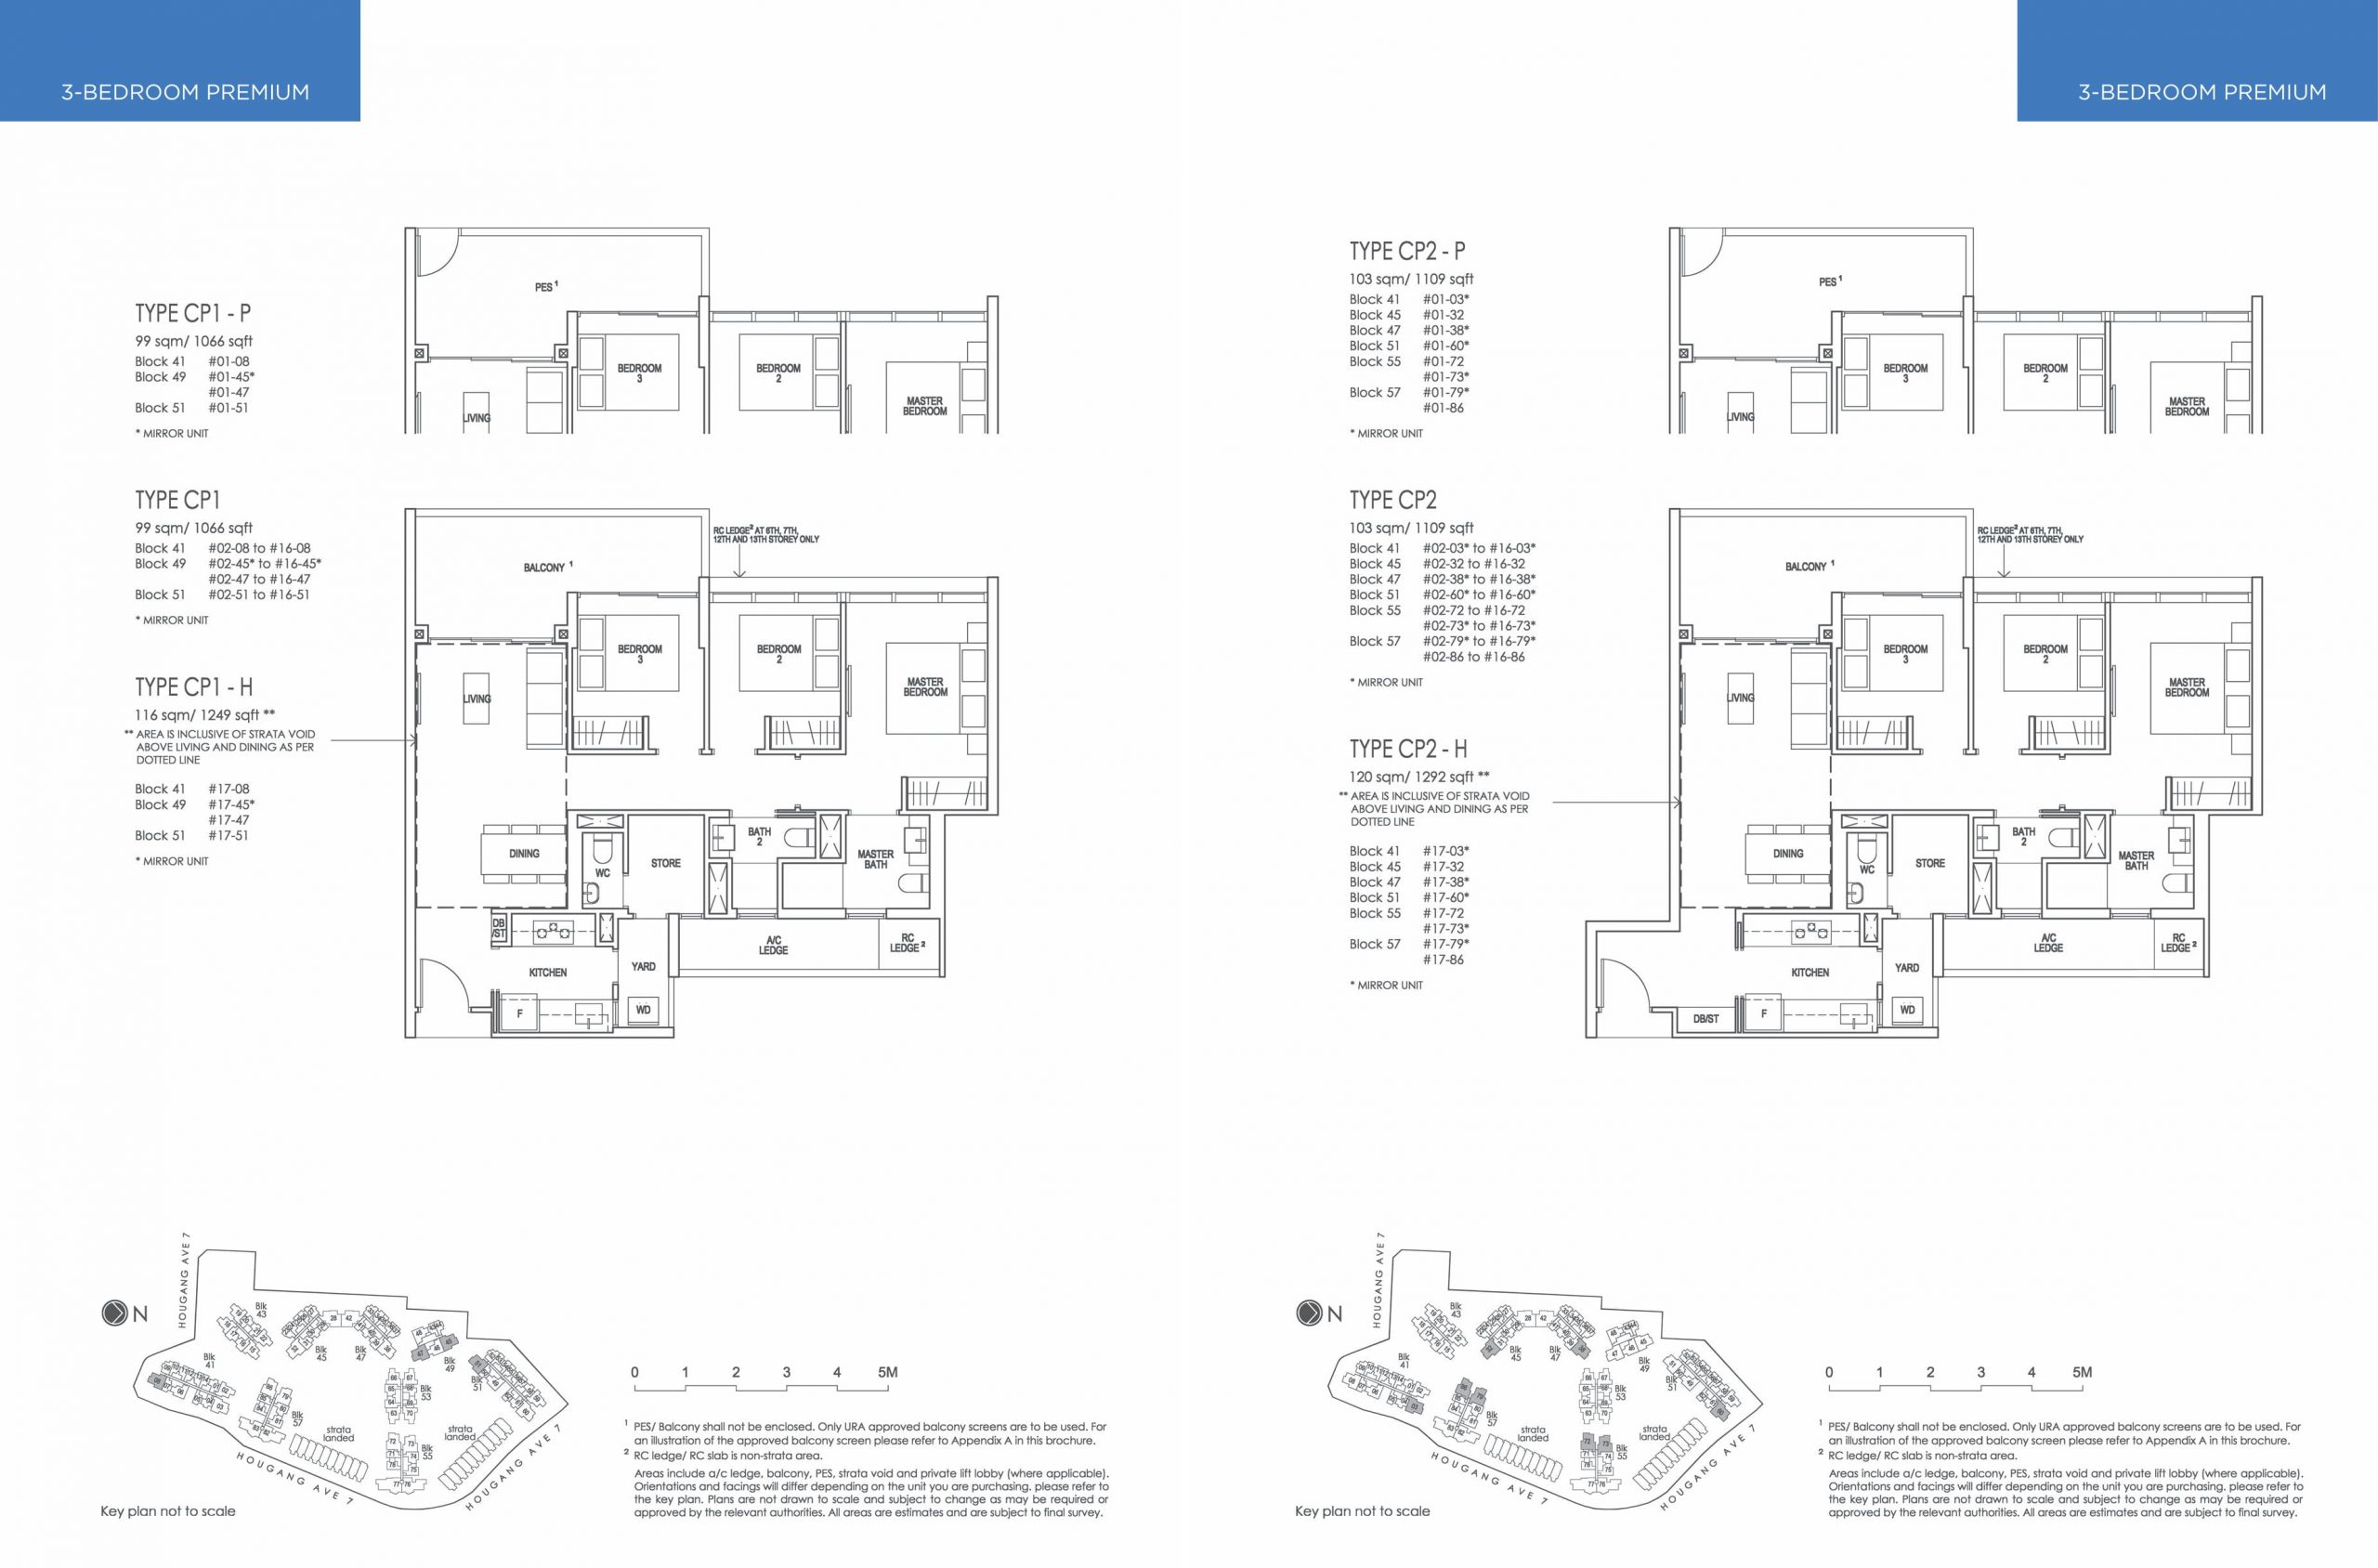 The Riverfront Residences' three-bedroom and three-bedroom premium types